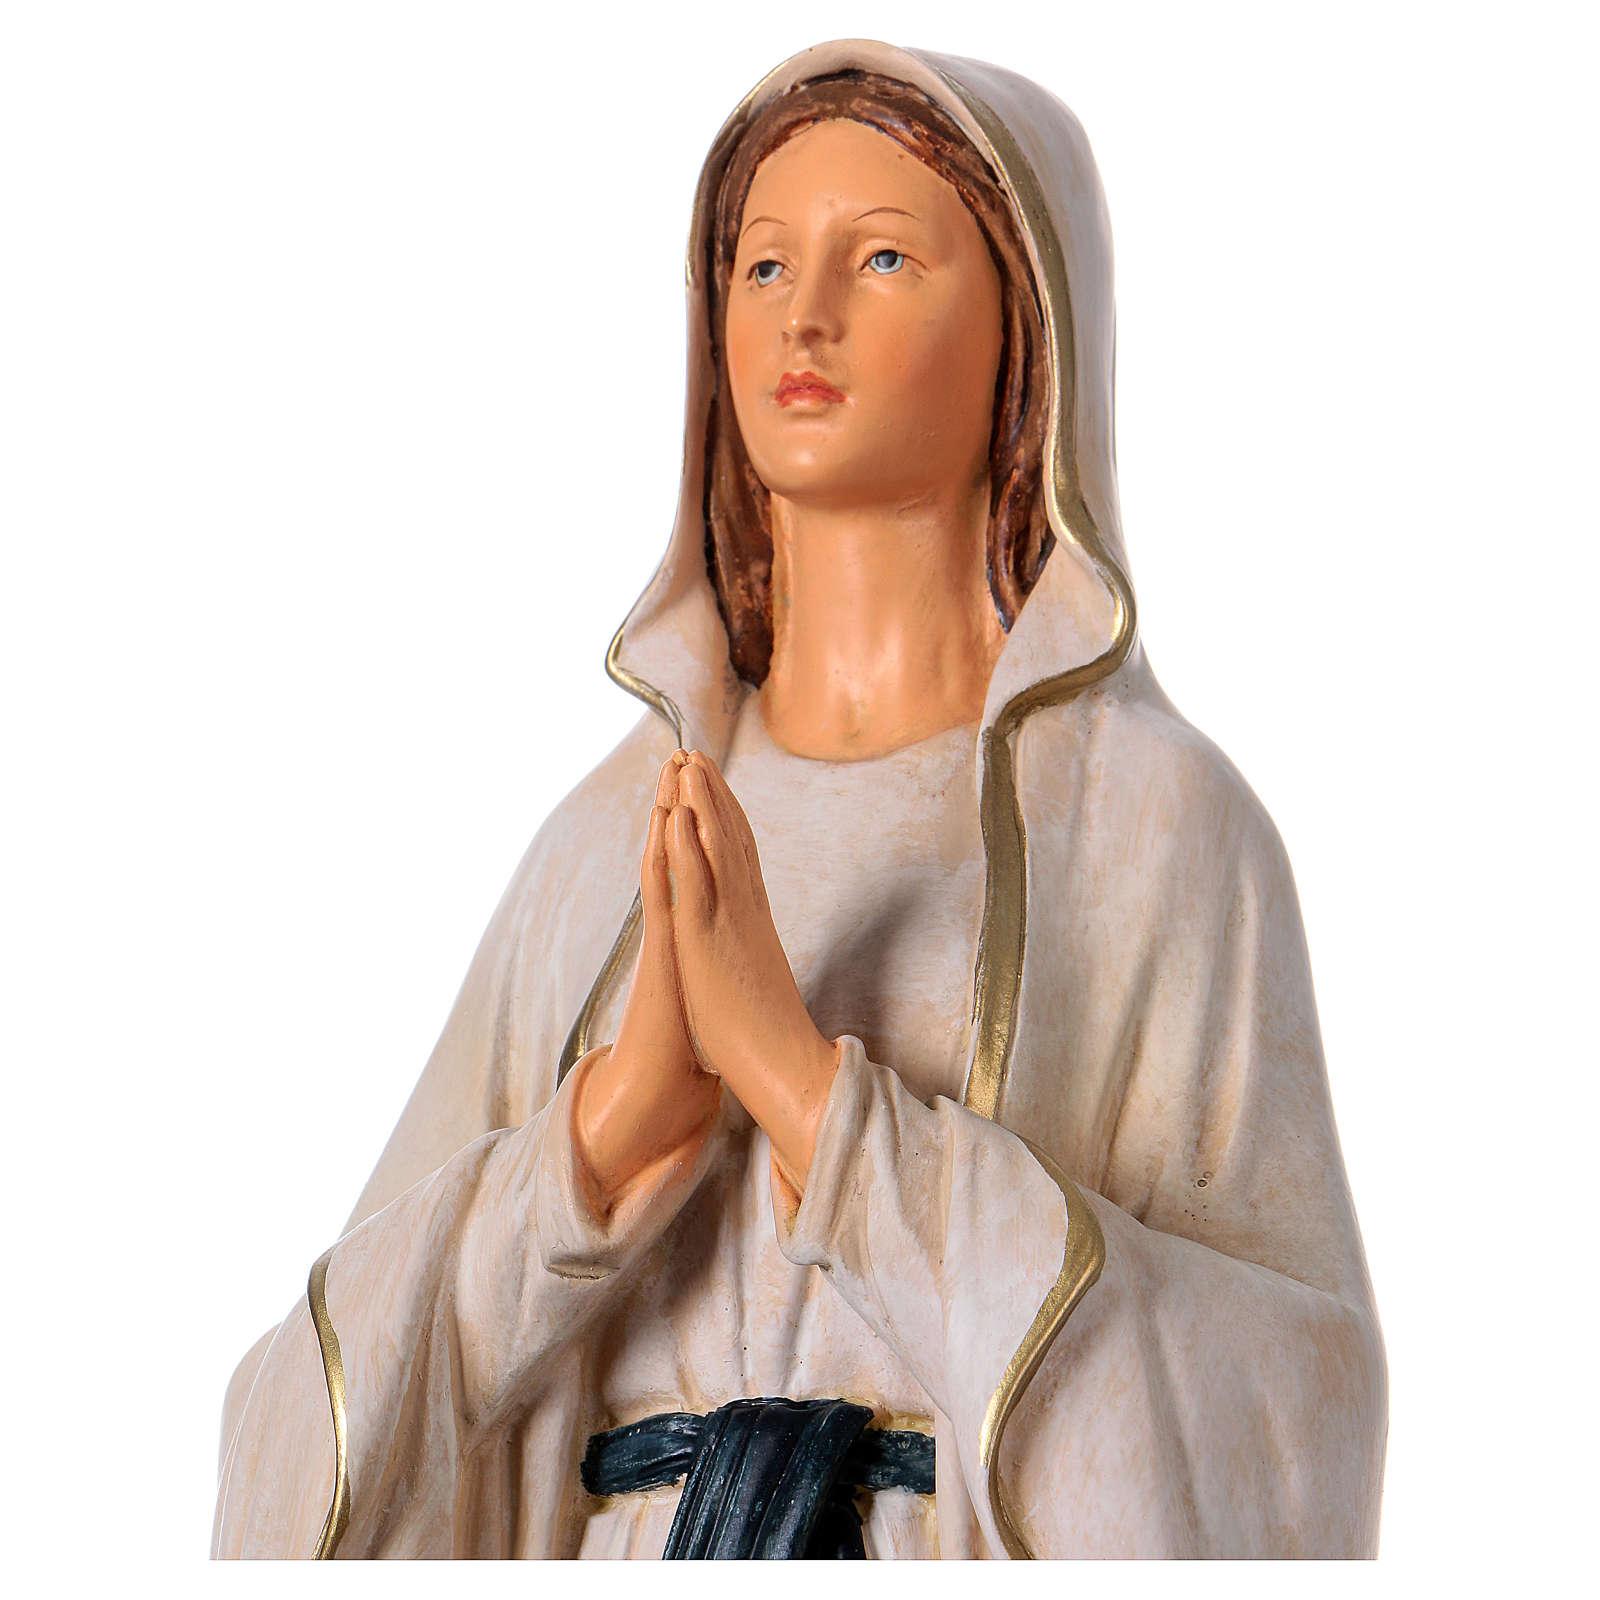 Estatua de resina Virgen de Lourdes 36 cm 4